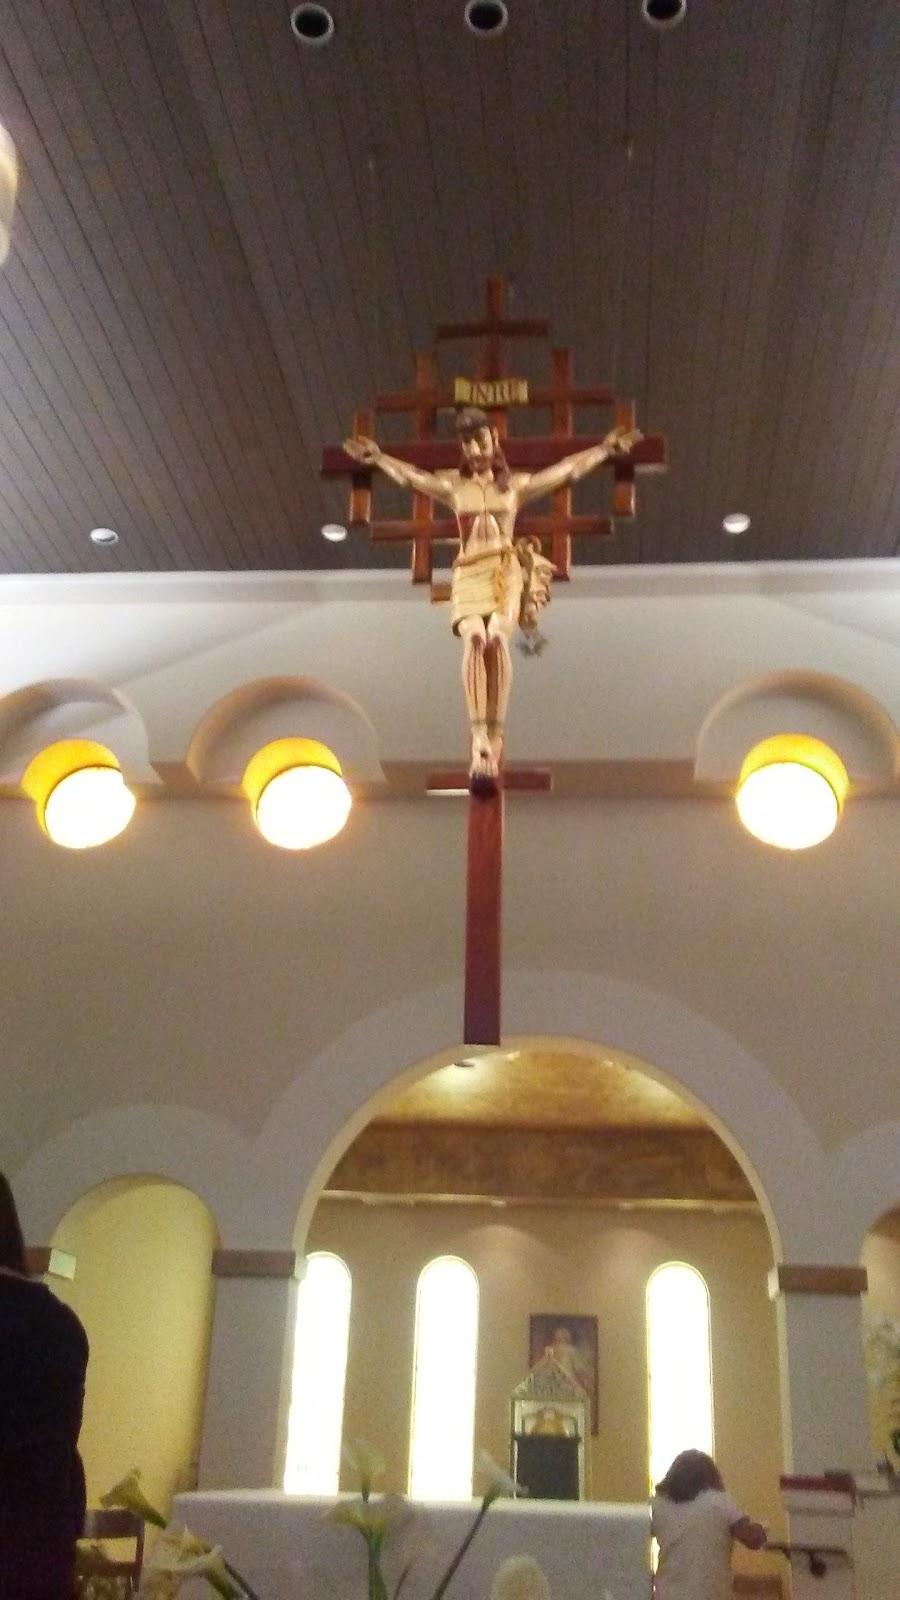 St Christophers Catholic Church - church    Photo 4 of 10   Address: 950 S Lincoln Way, Galt, CA 95632, USA   Phone: (209) 745-1389